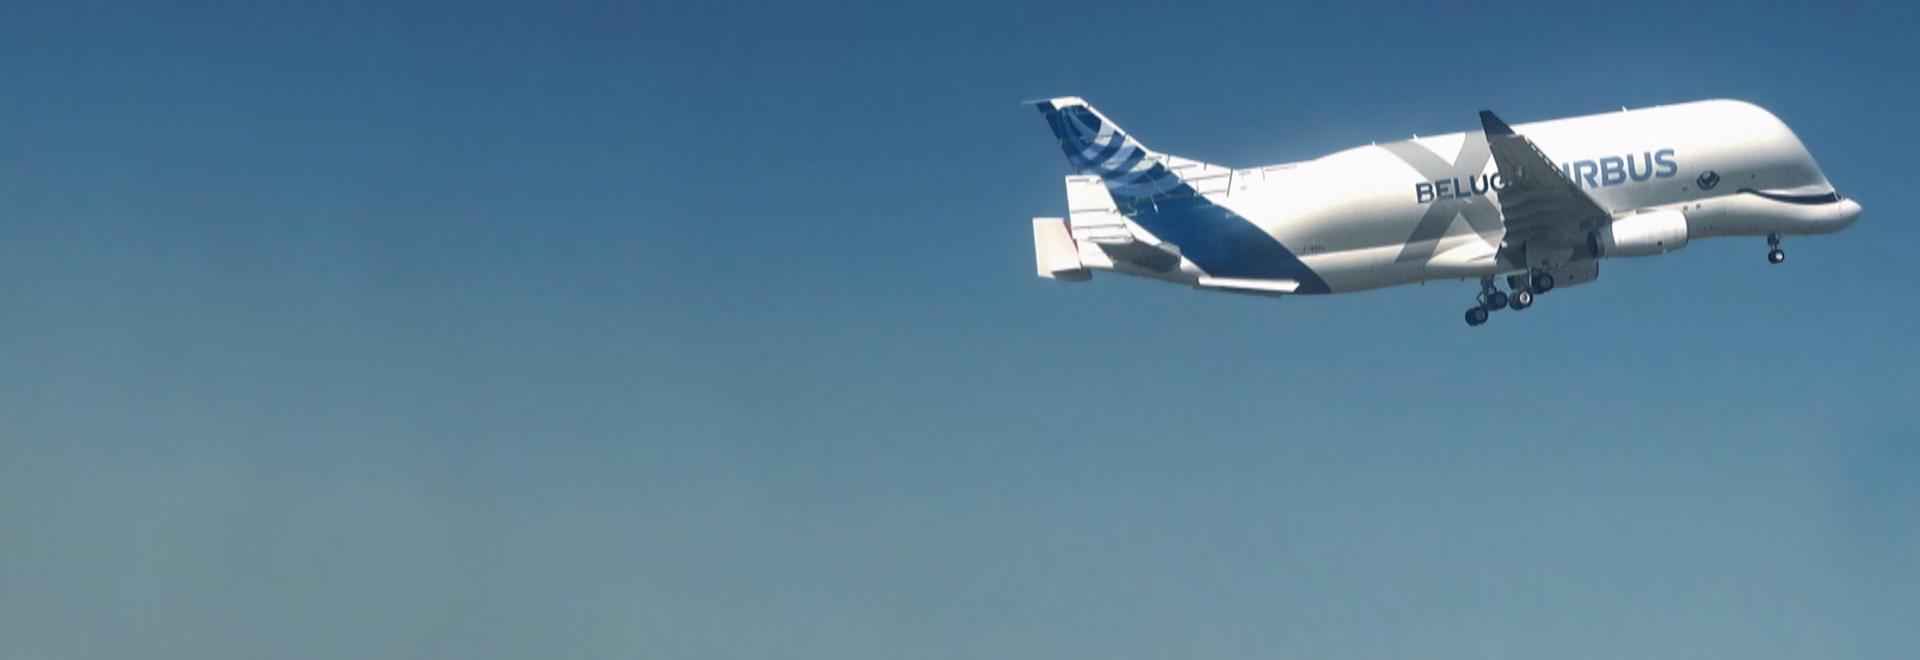 Mega strutture: l'Airbus Beluga XL